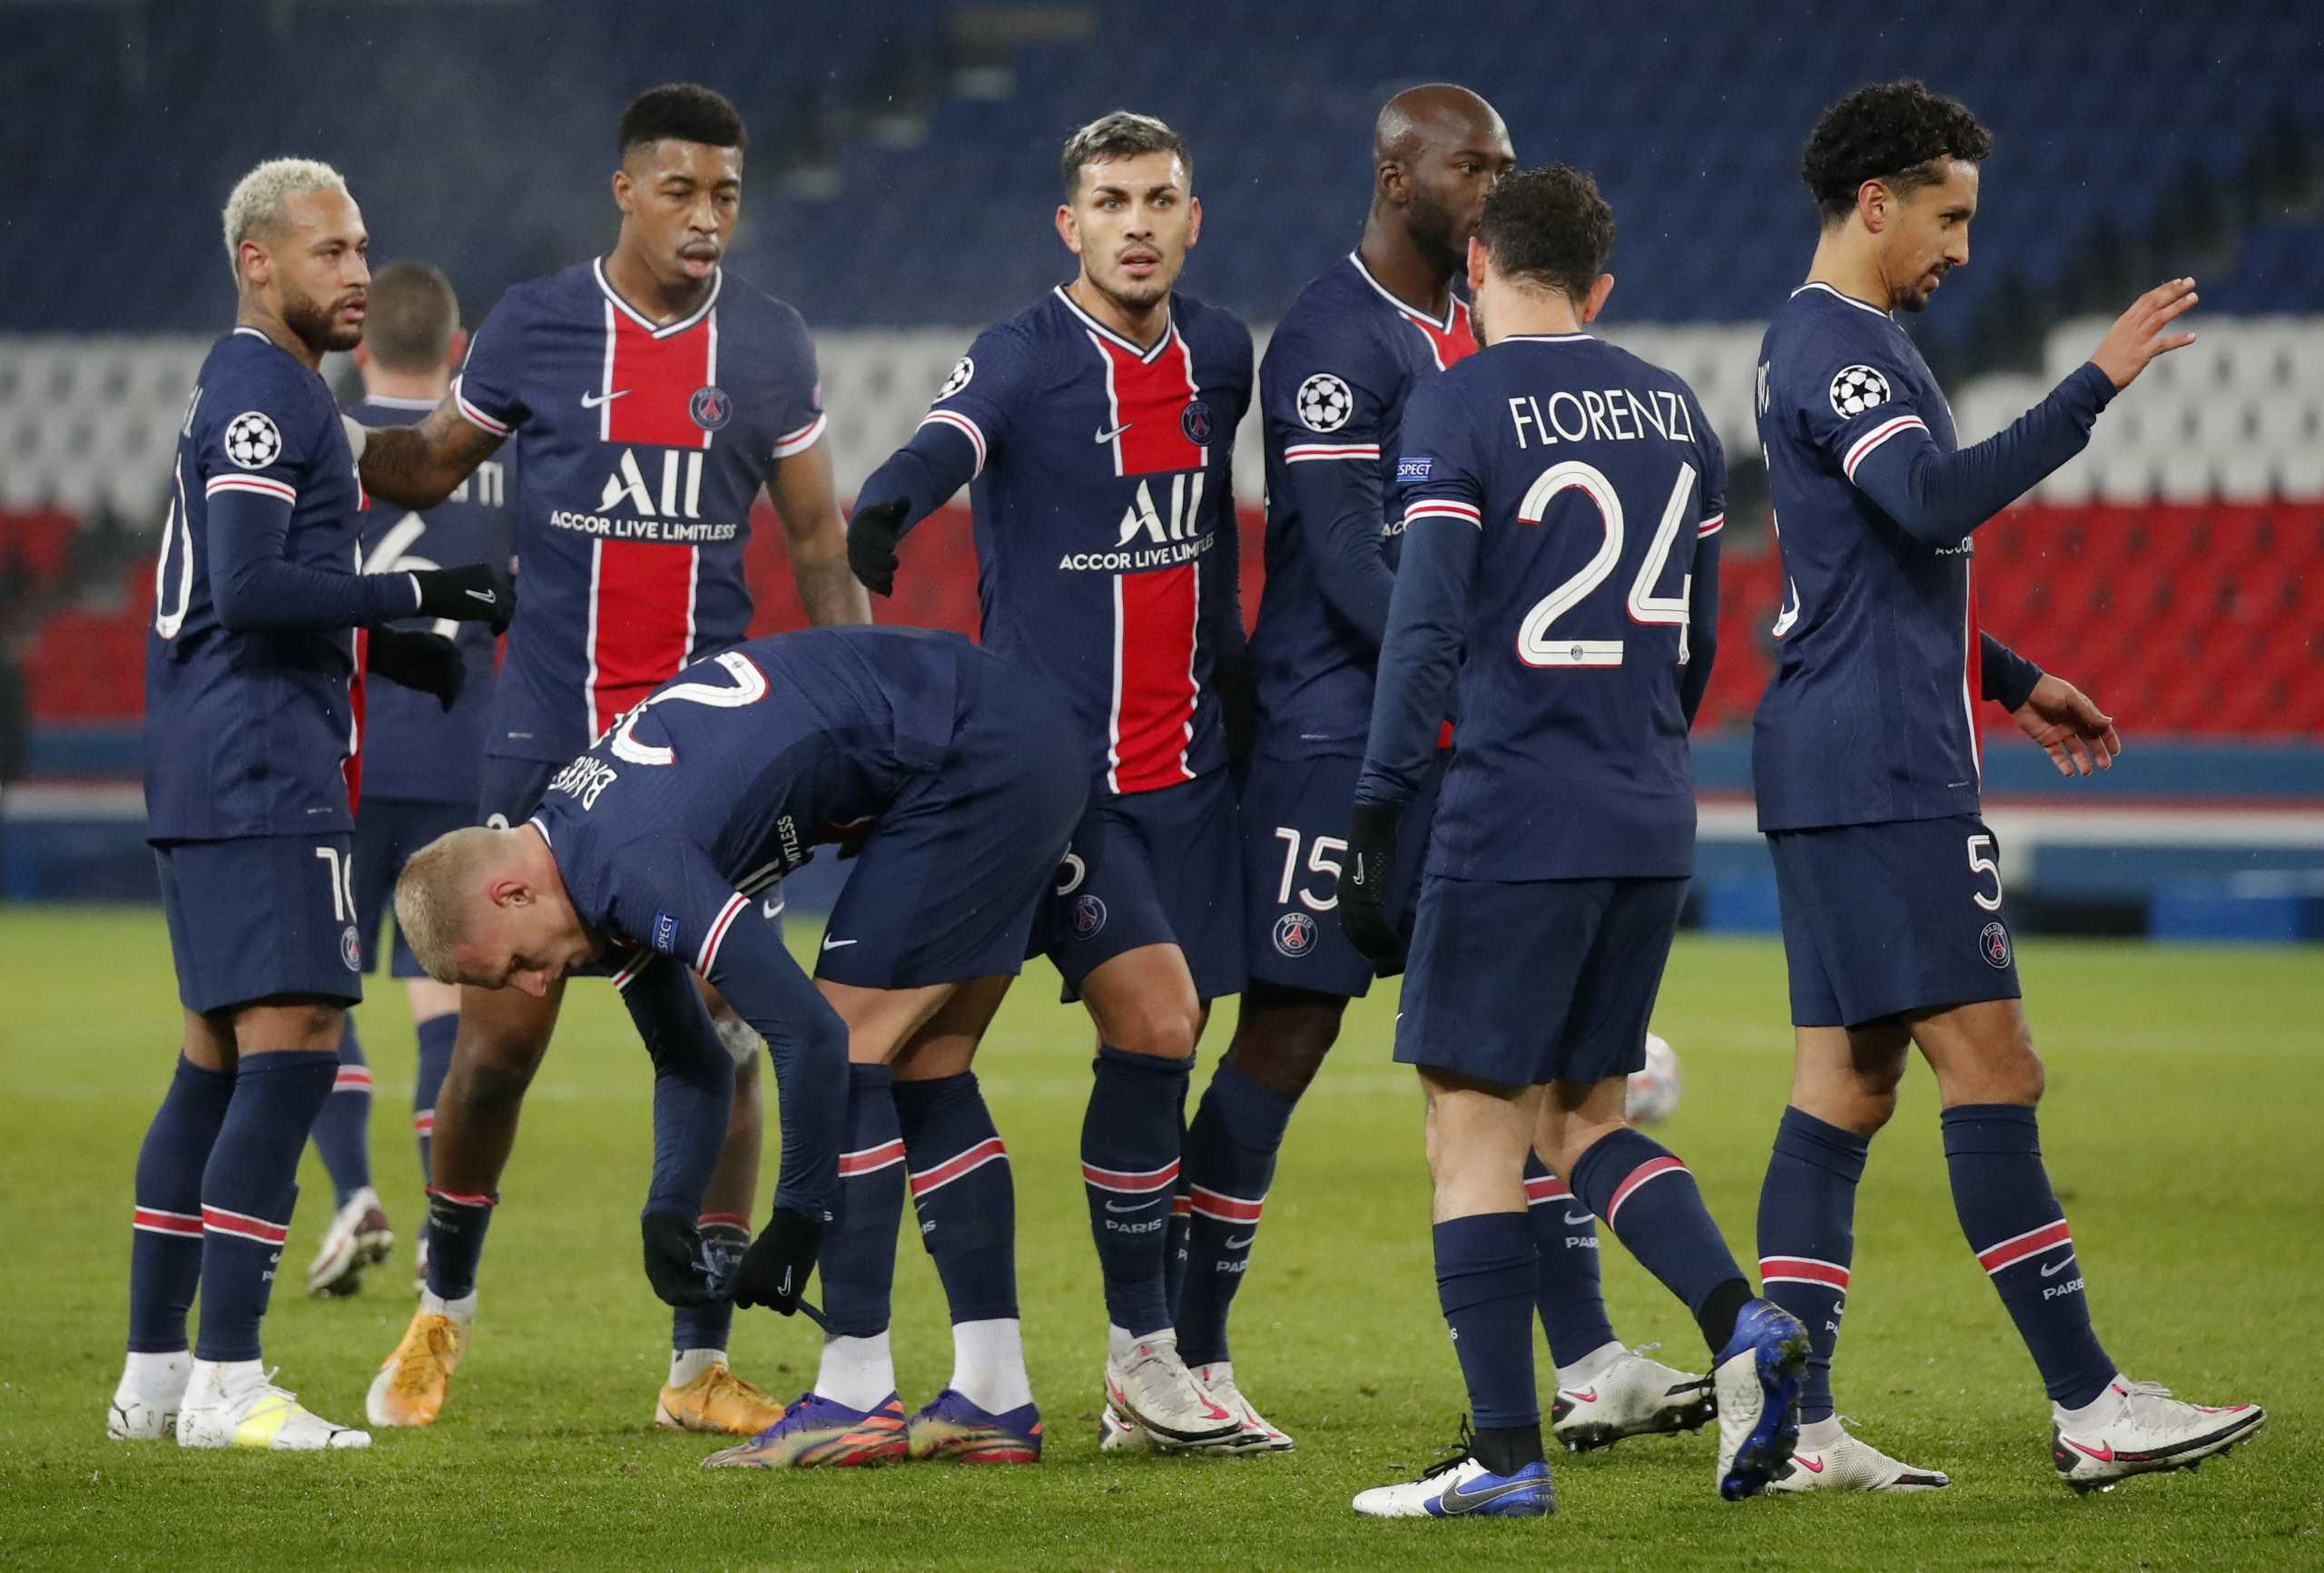 Champions League: Πεντάστερη και πρώτη η Παρί! Χατ-τρικ από τον Νεϊμάρ (video)